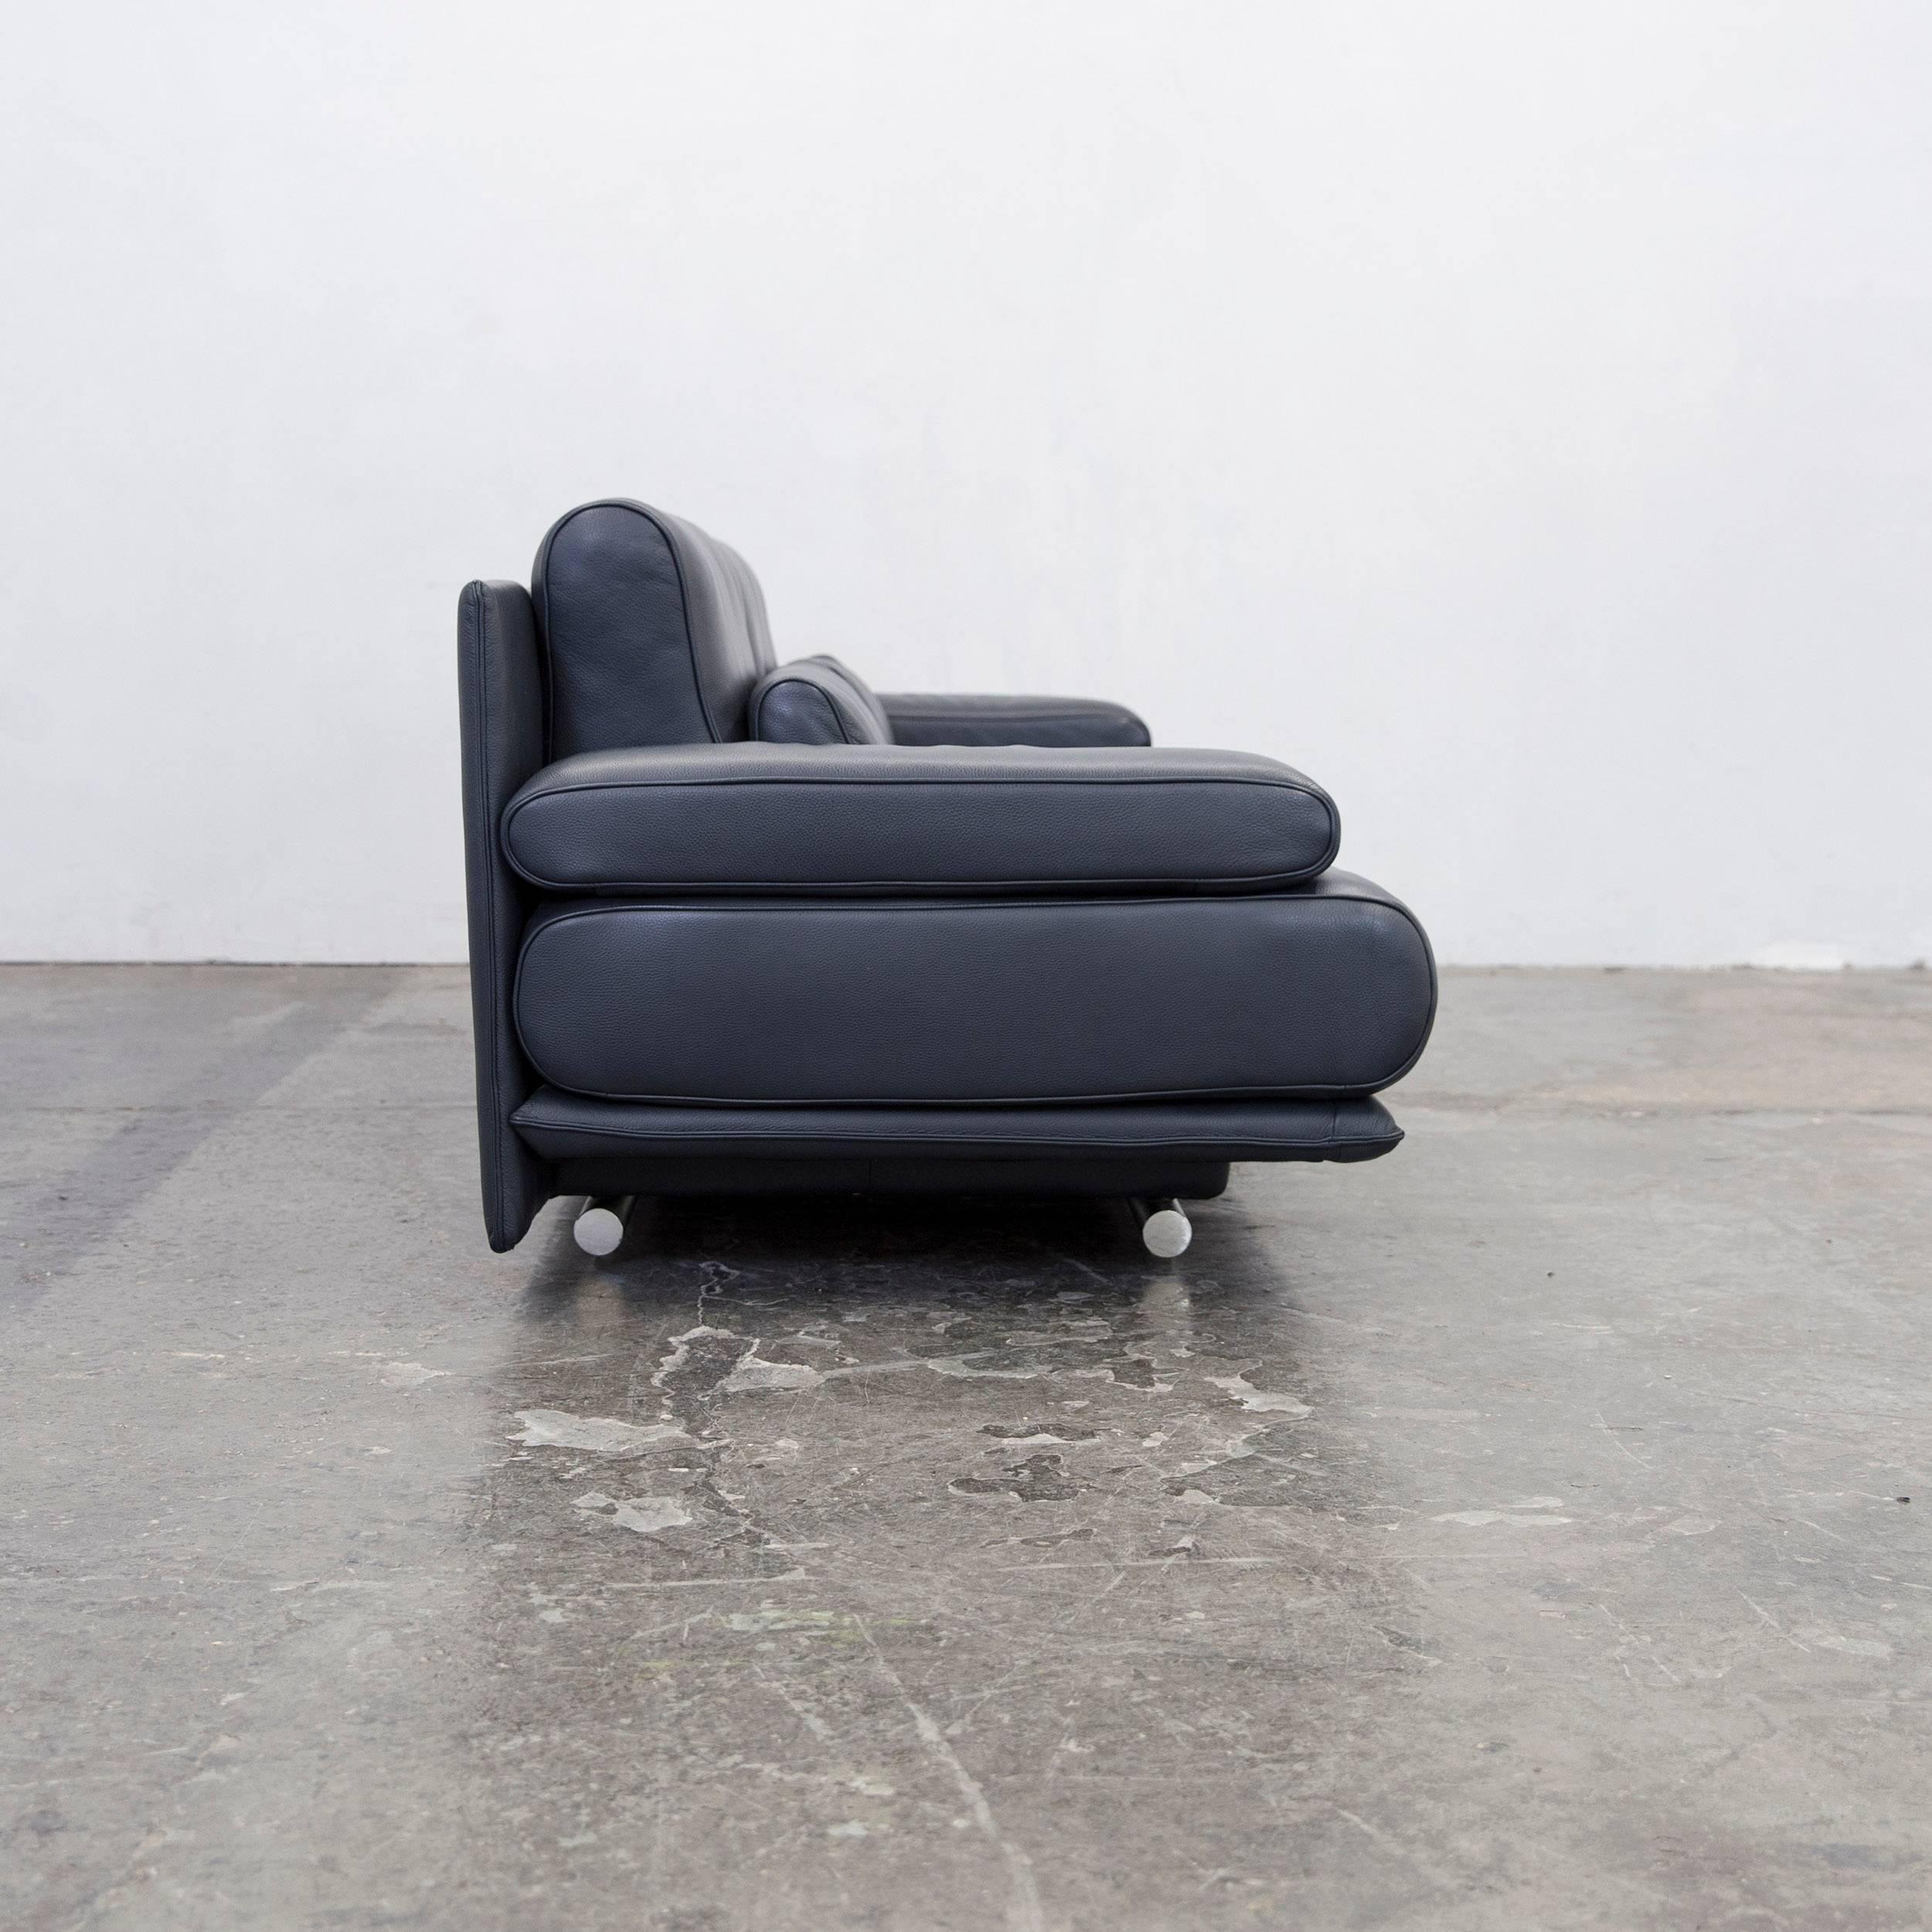 leder schlafcouch cheap designer schlafcouch elegant how. Black Bedroom Furniture Sets. Home Design Ideas